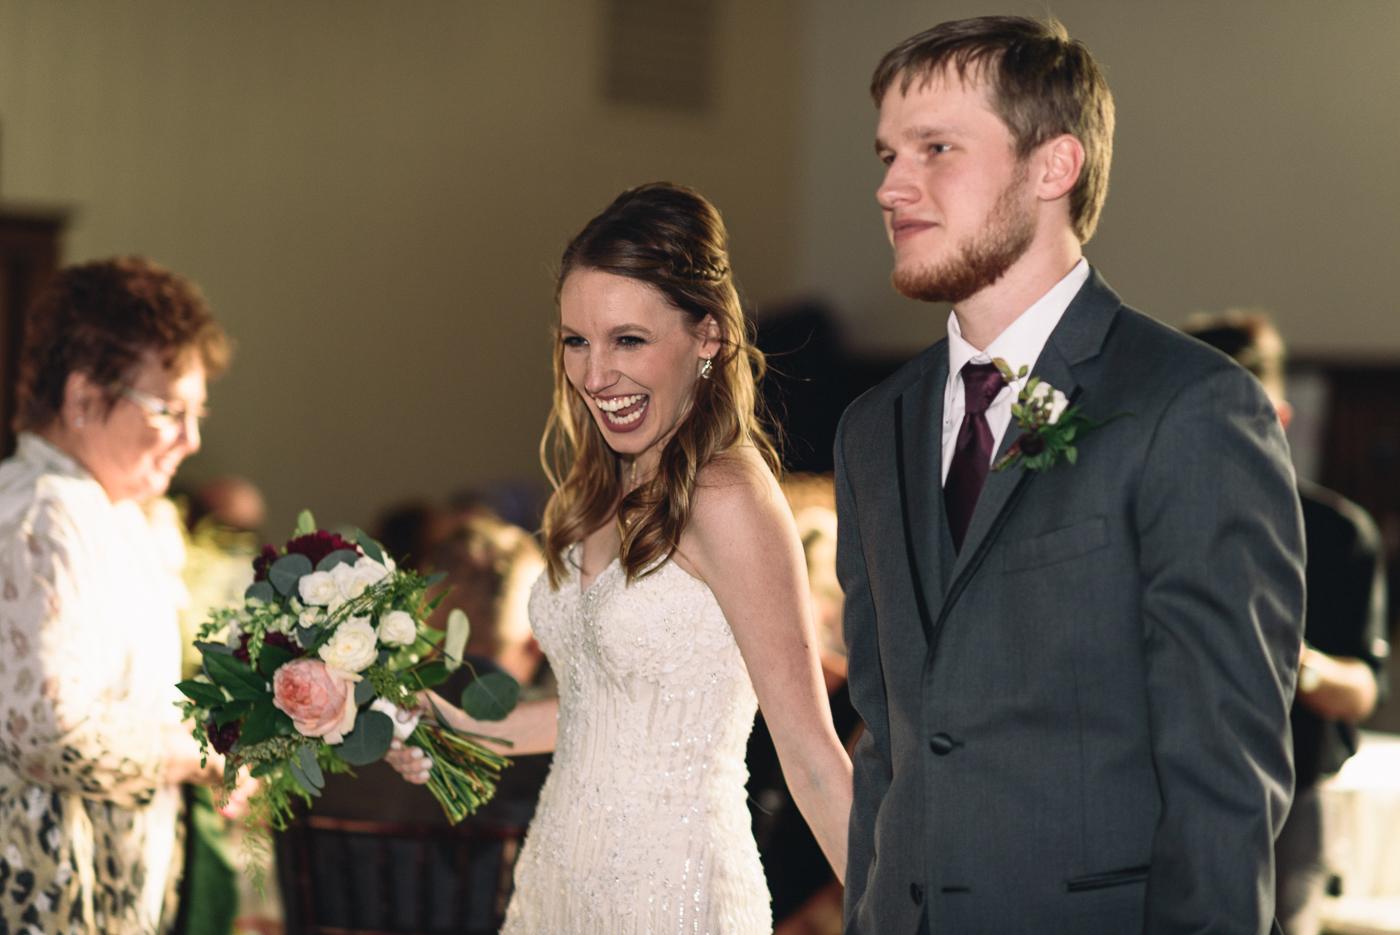 wedding reception bride and groom grand entrance bouquet